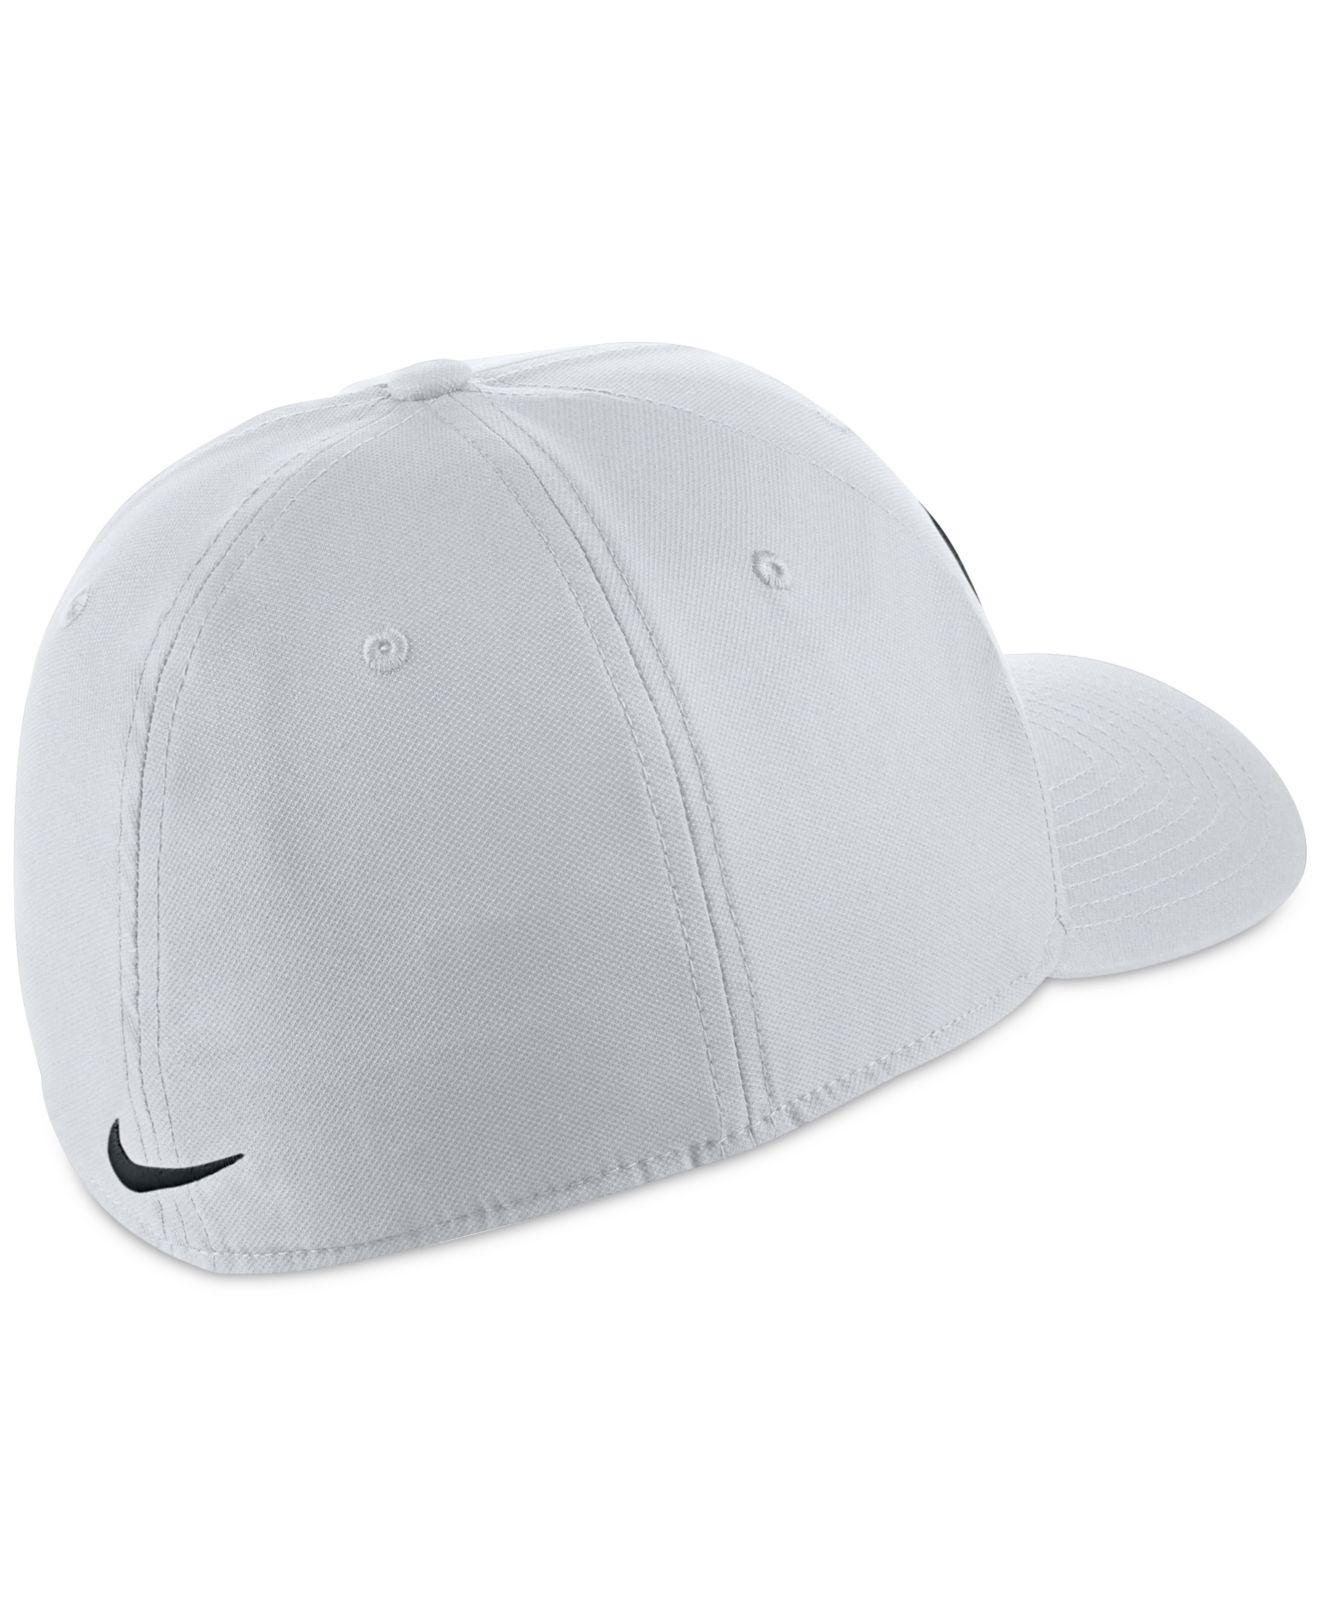 Lyst - Nike Men s Classic99 Dri-fit Golf Hat in White for Men cbb8046510f